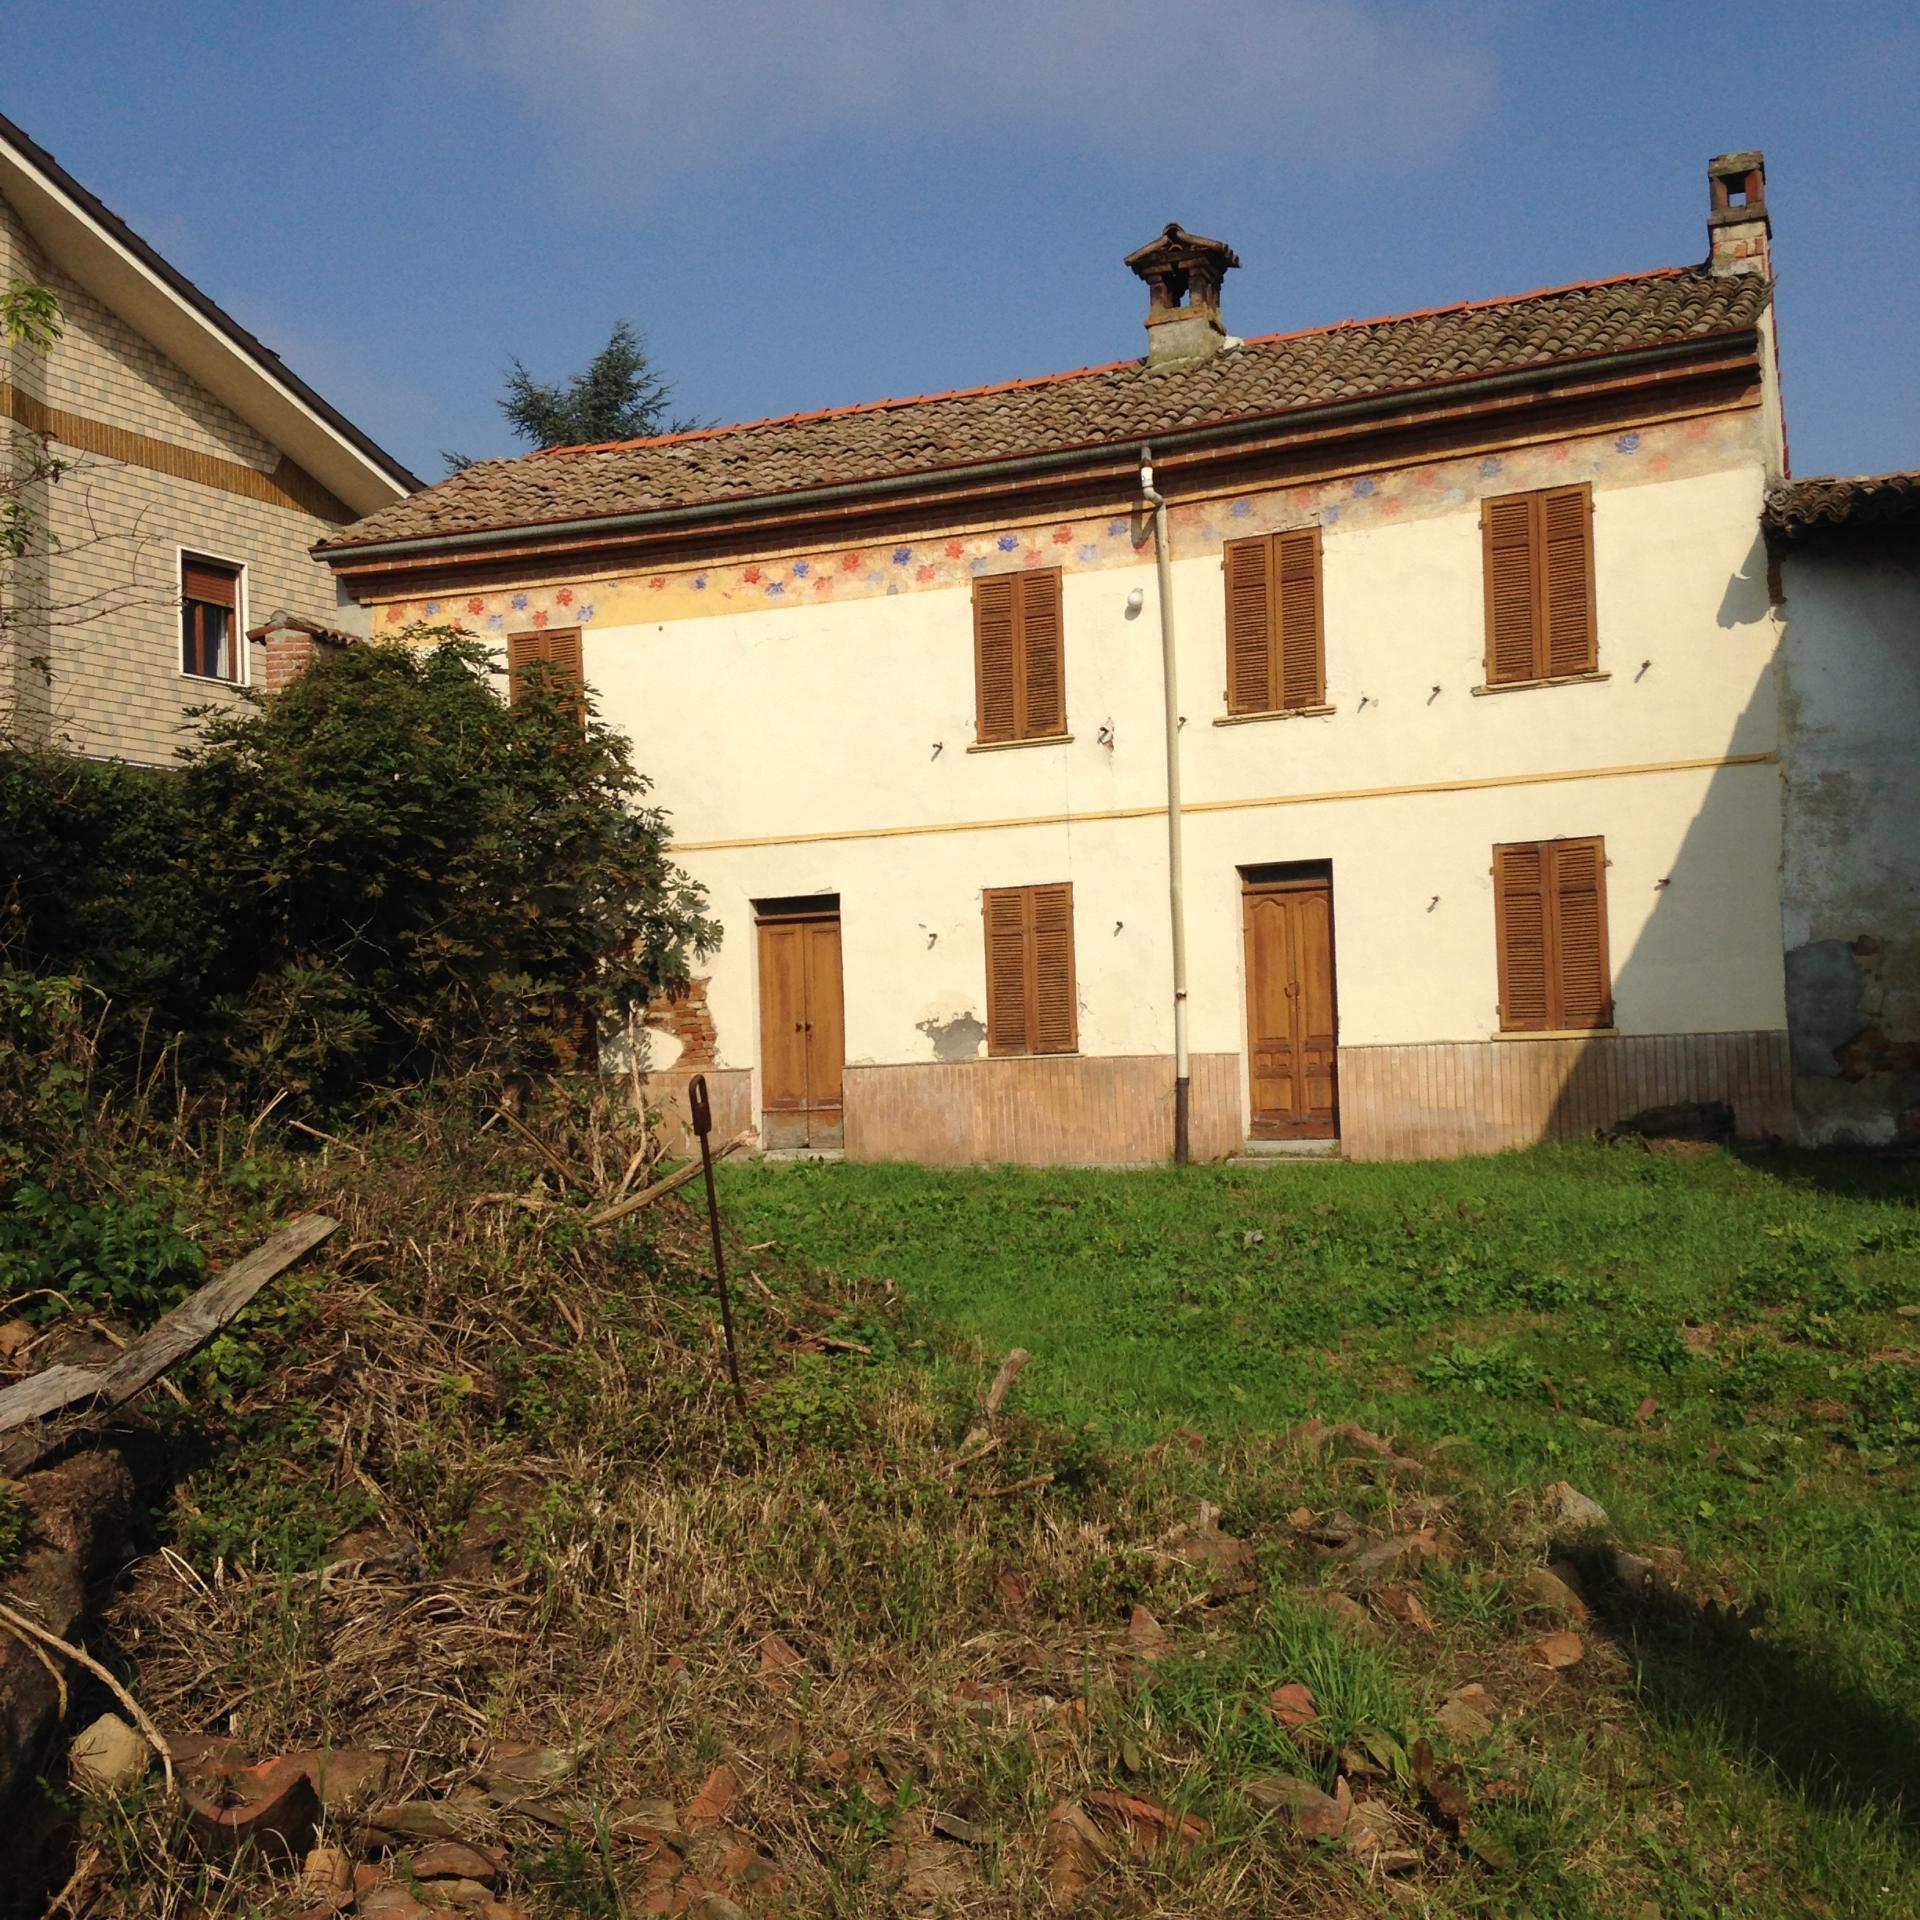 Casa indipendente in Vendita a Bassignana: 5 locali, 200 mq